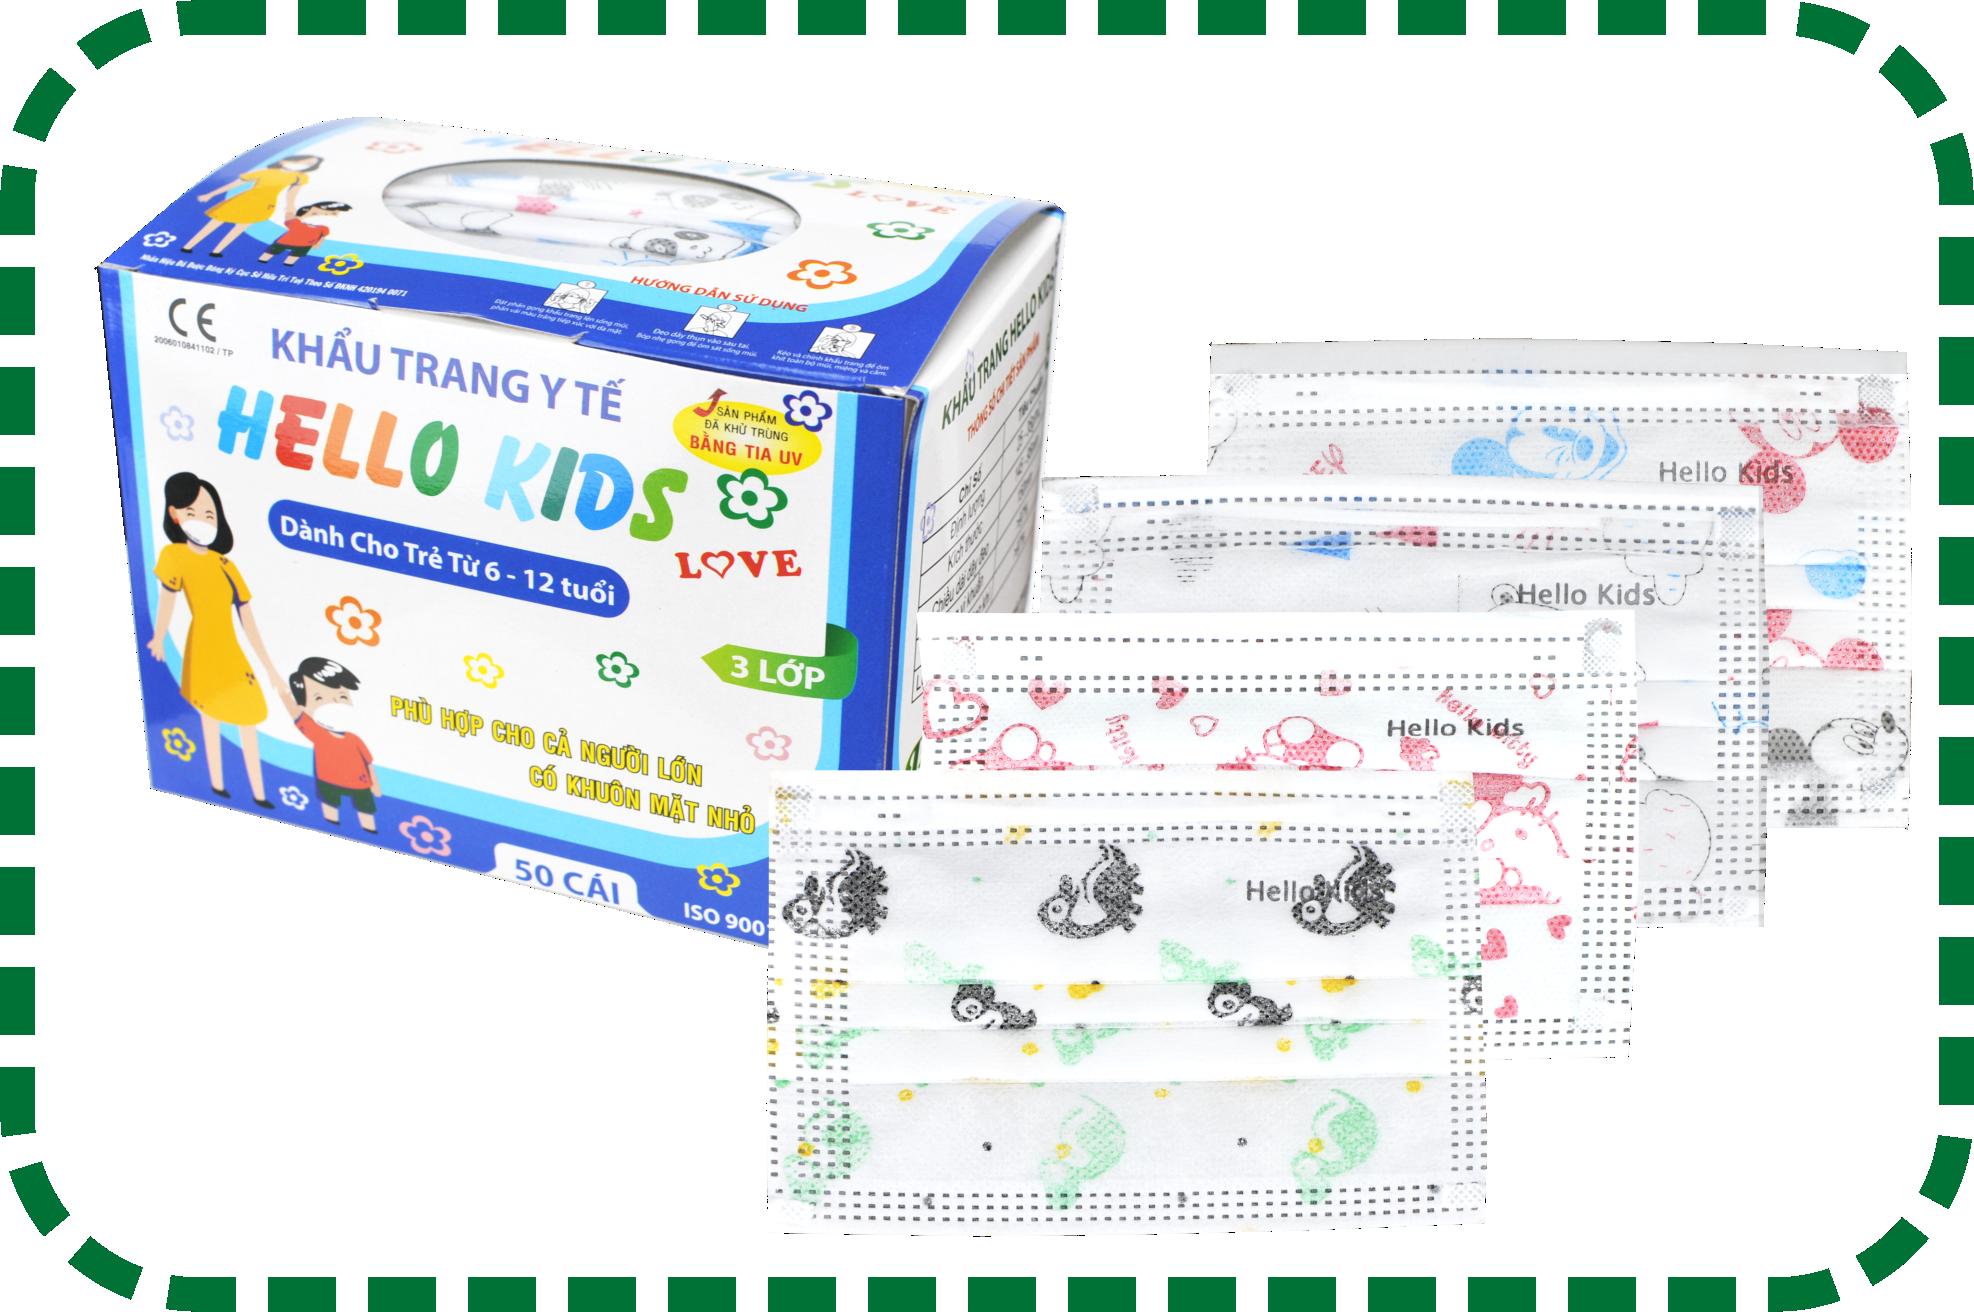 Khẩu Trang Y Tế Hello Kids (3 Lớp)